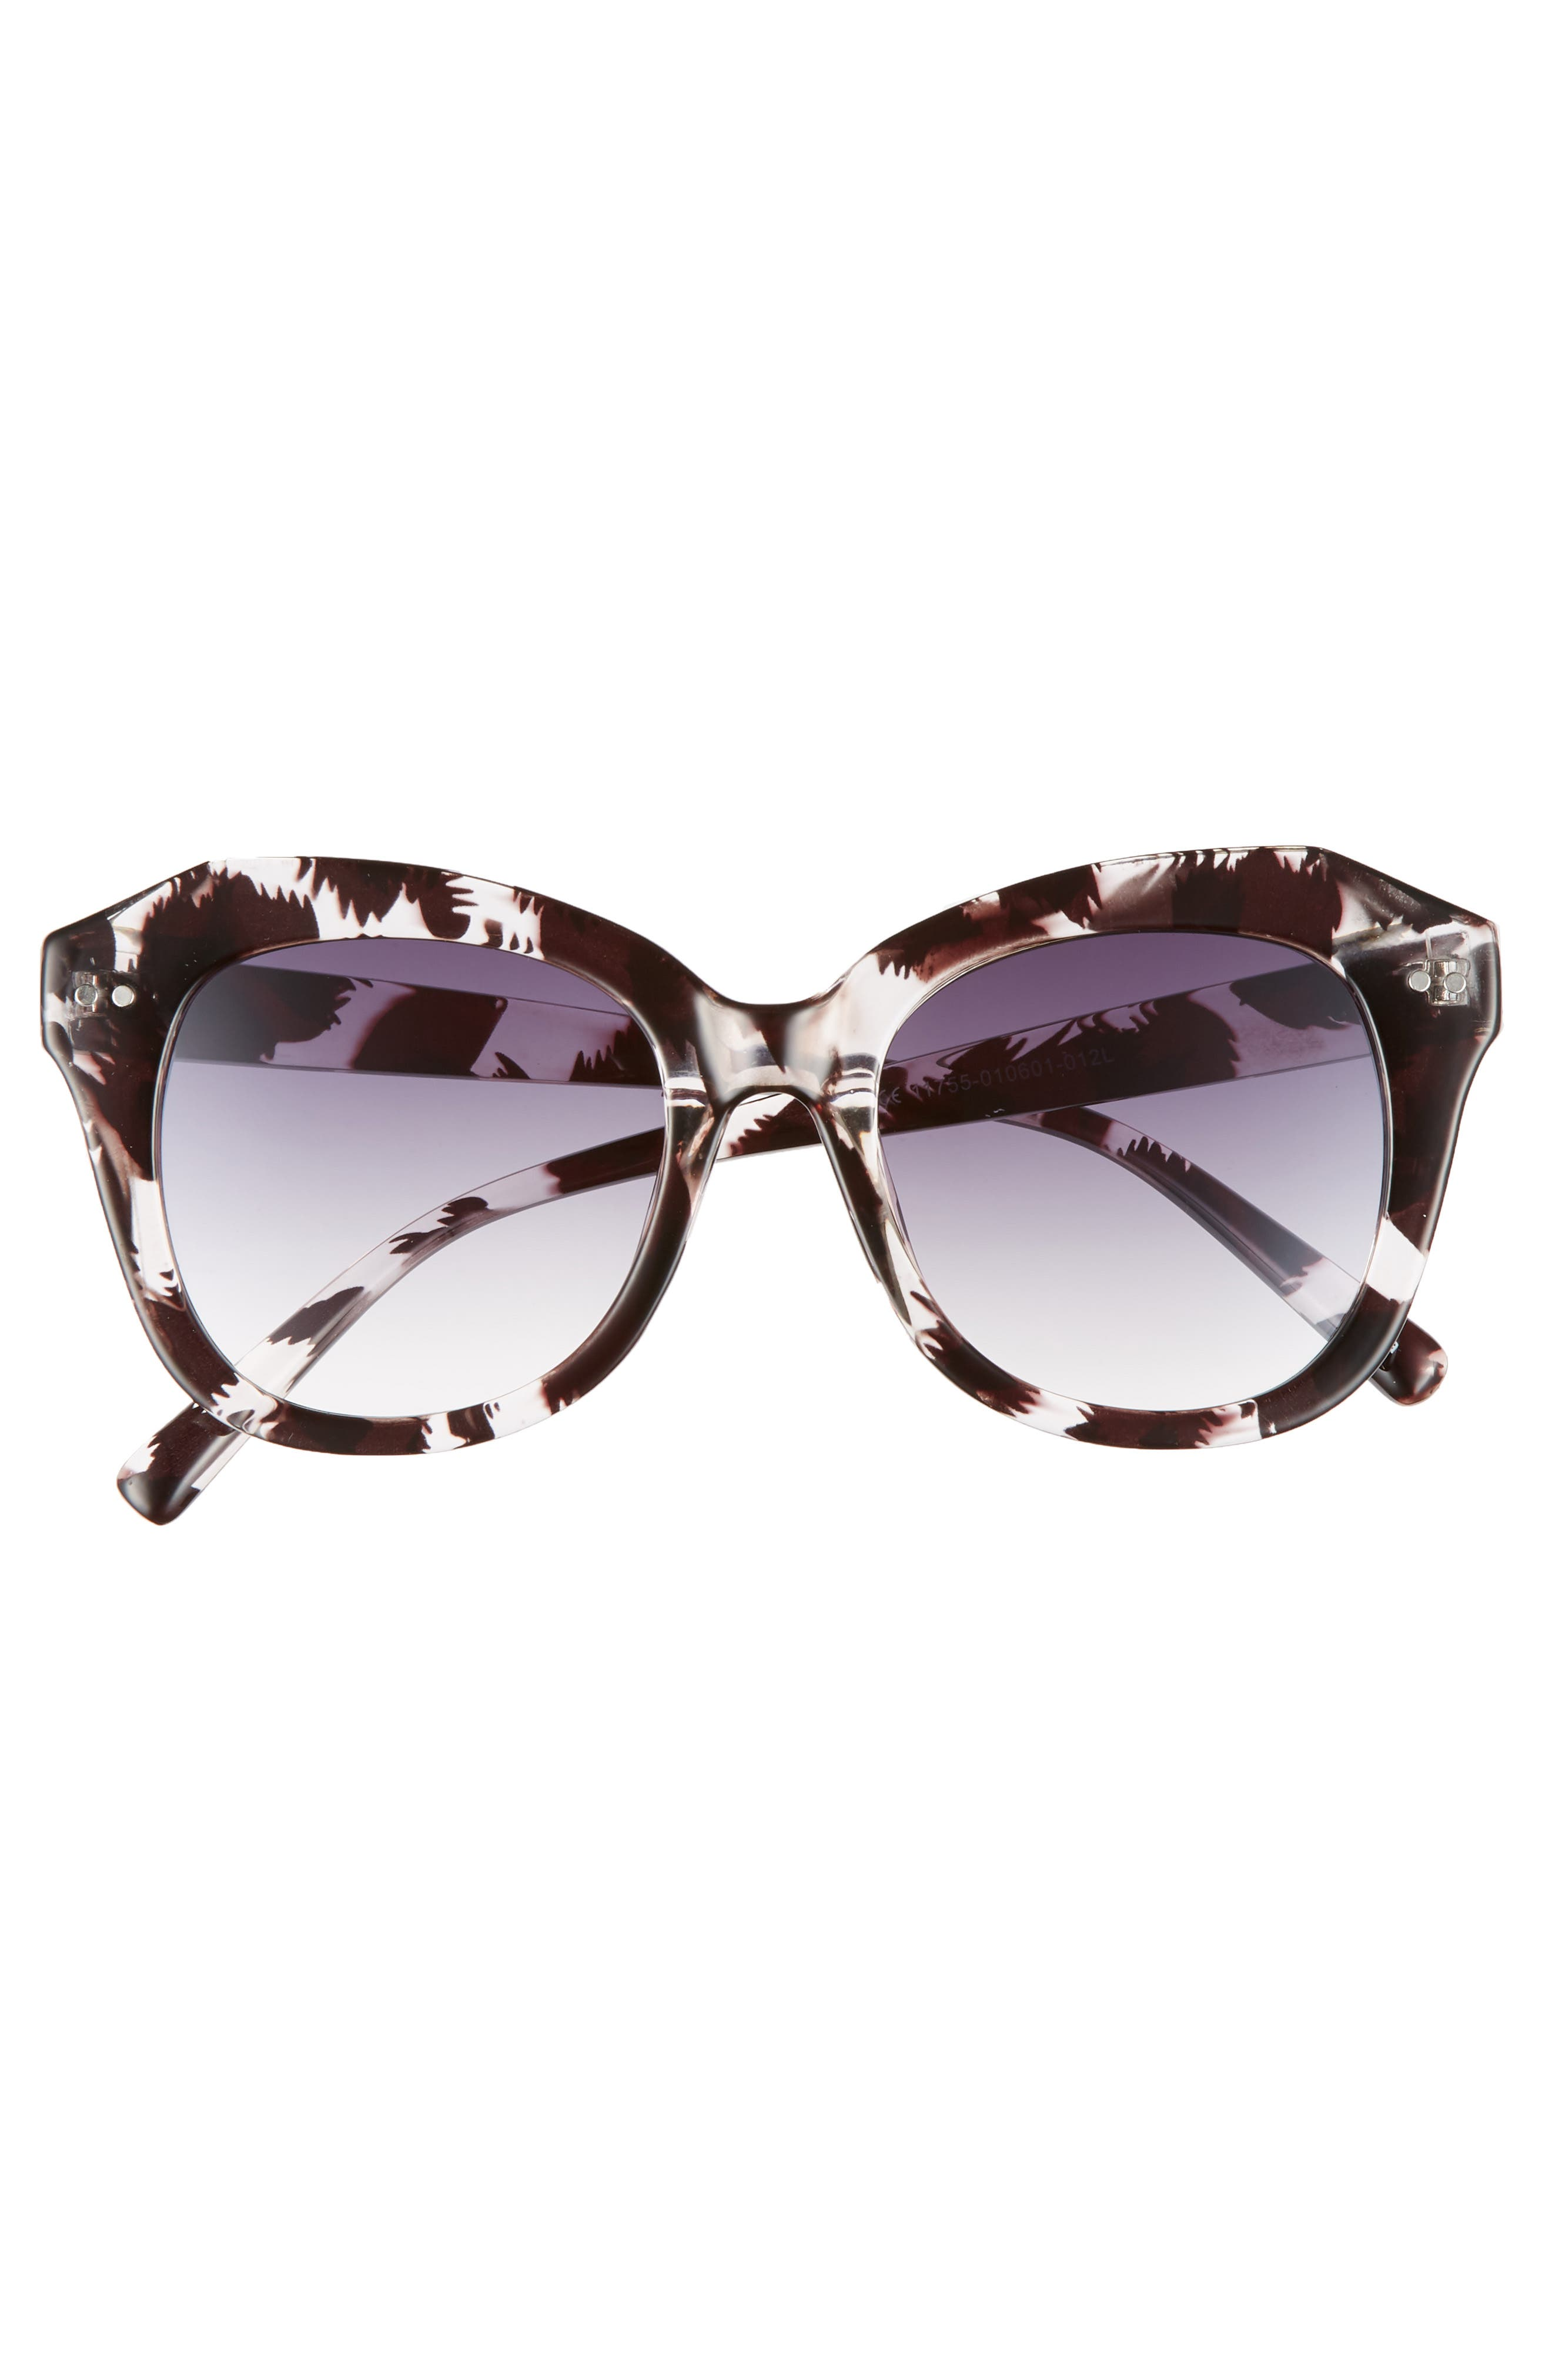 Marbled Square Sunglasses,                             Alternate thumbnail 3, color,                             001